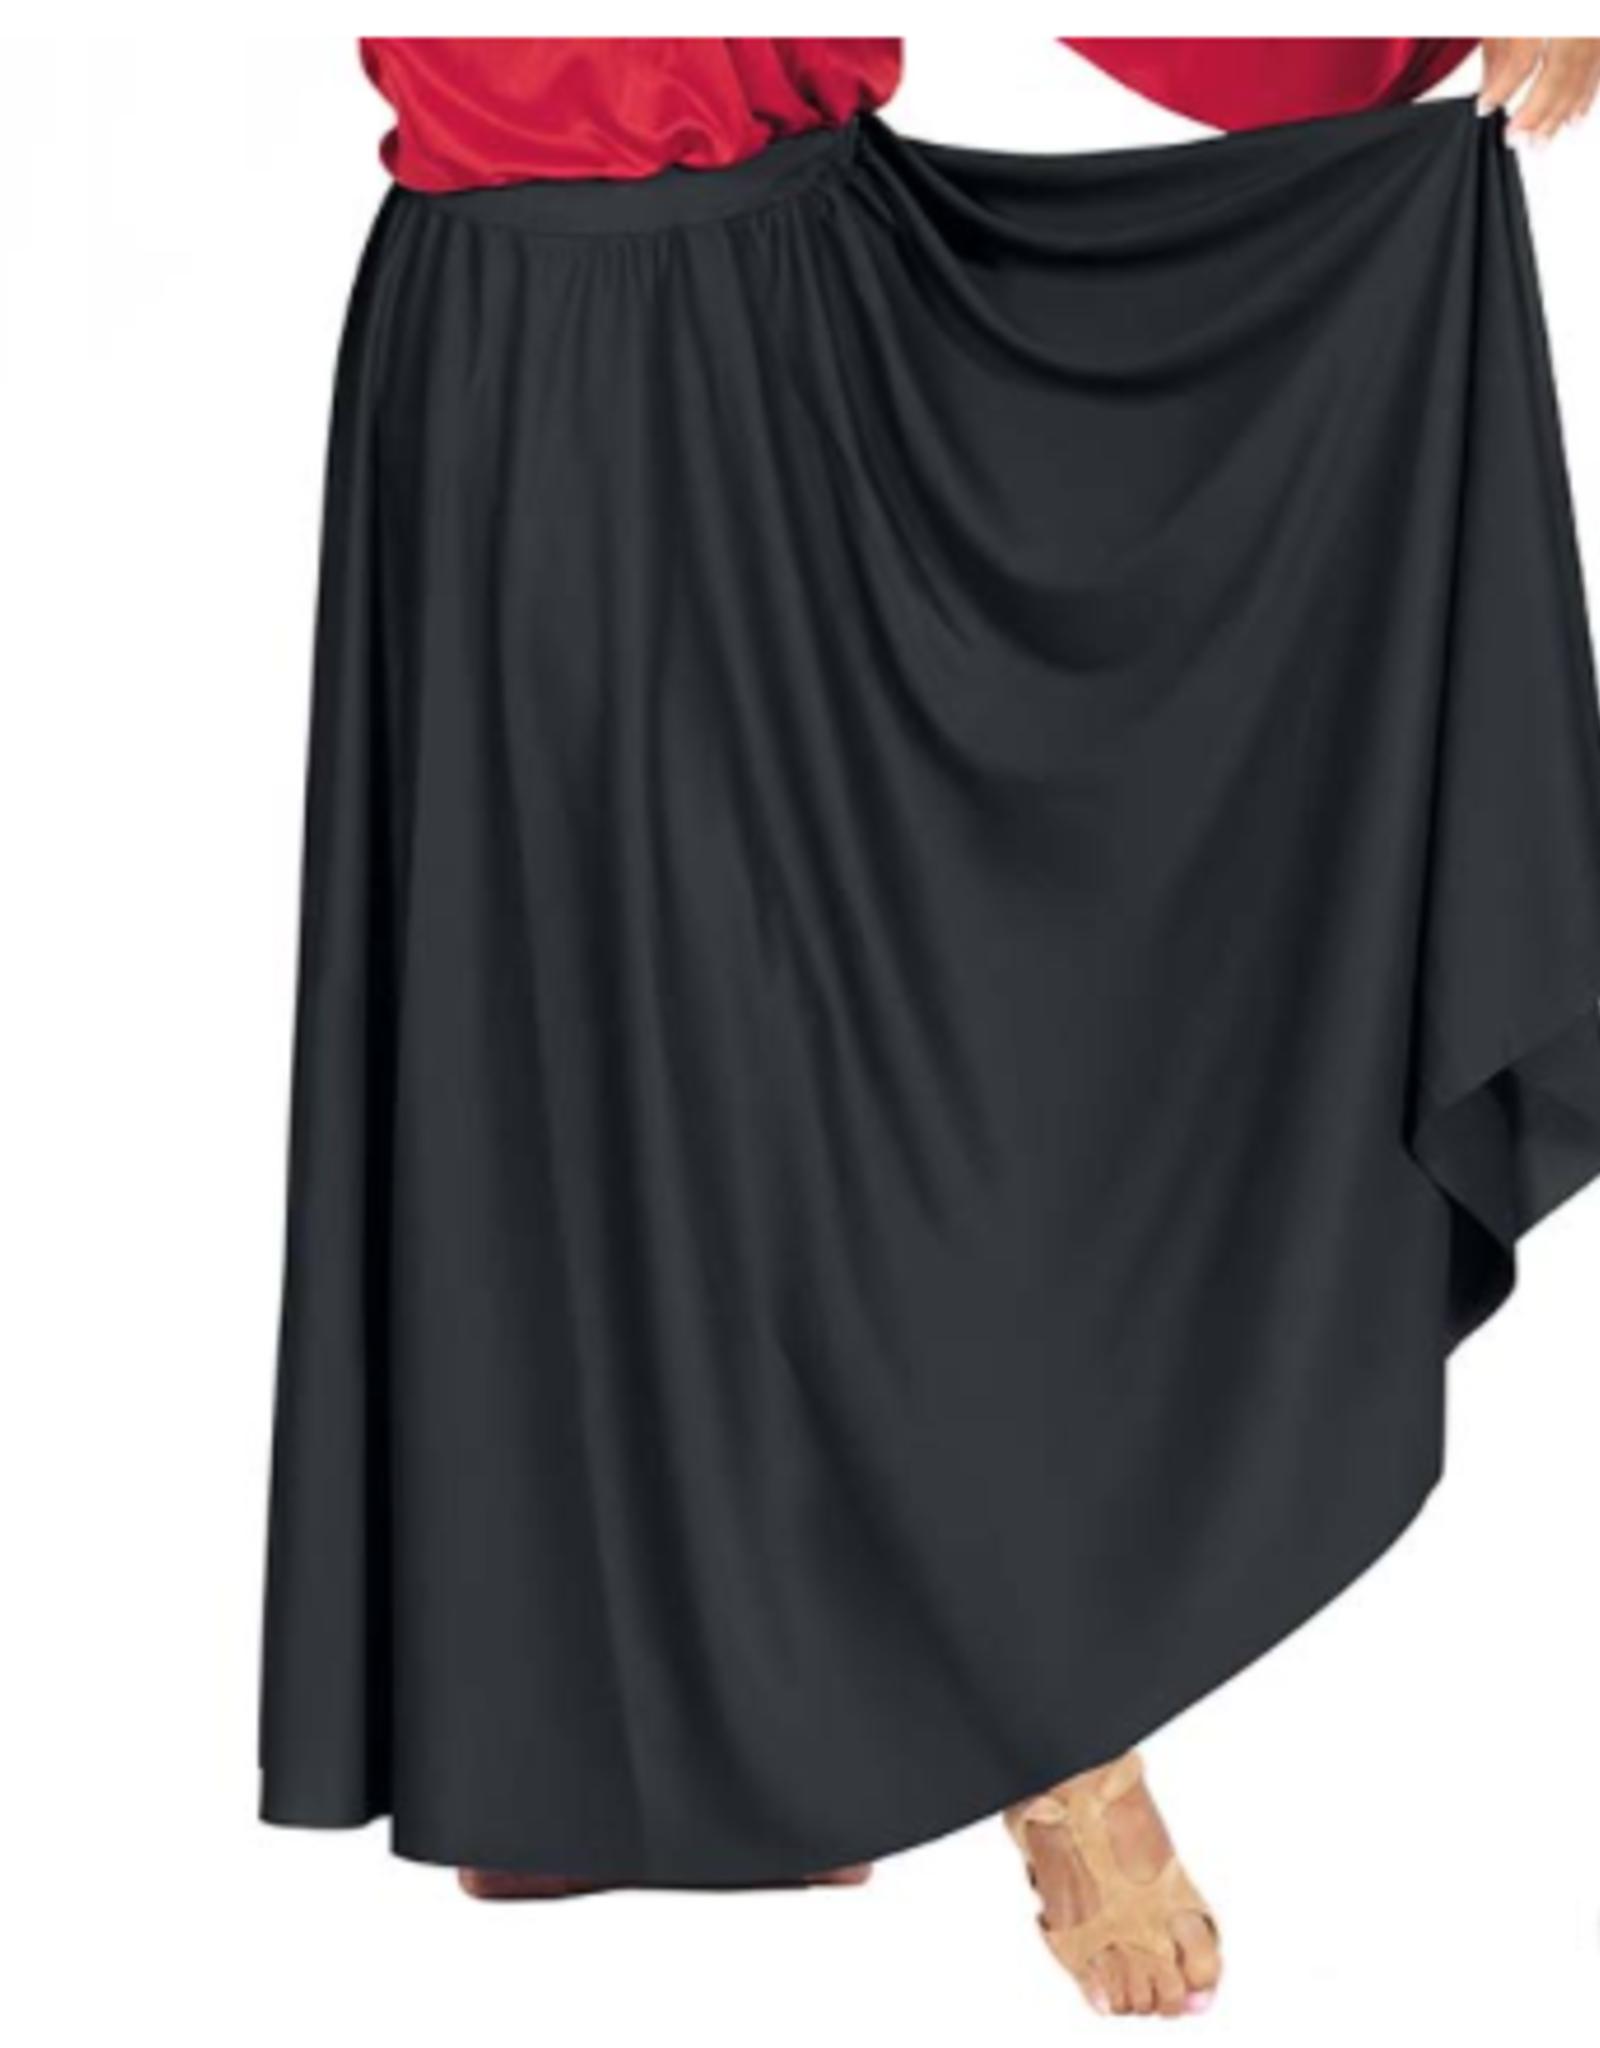 Eurotard E-13778 Circle Skirt Adult